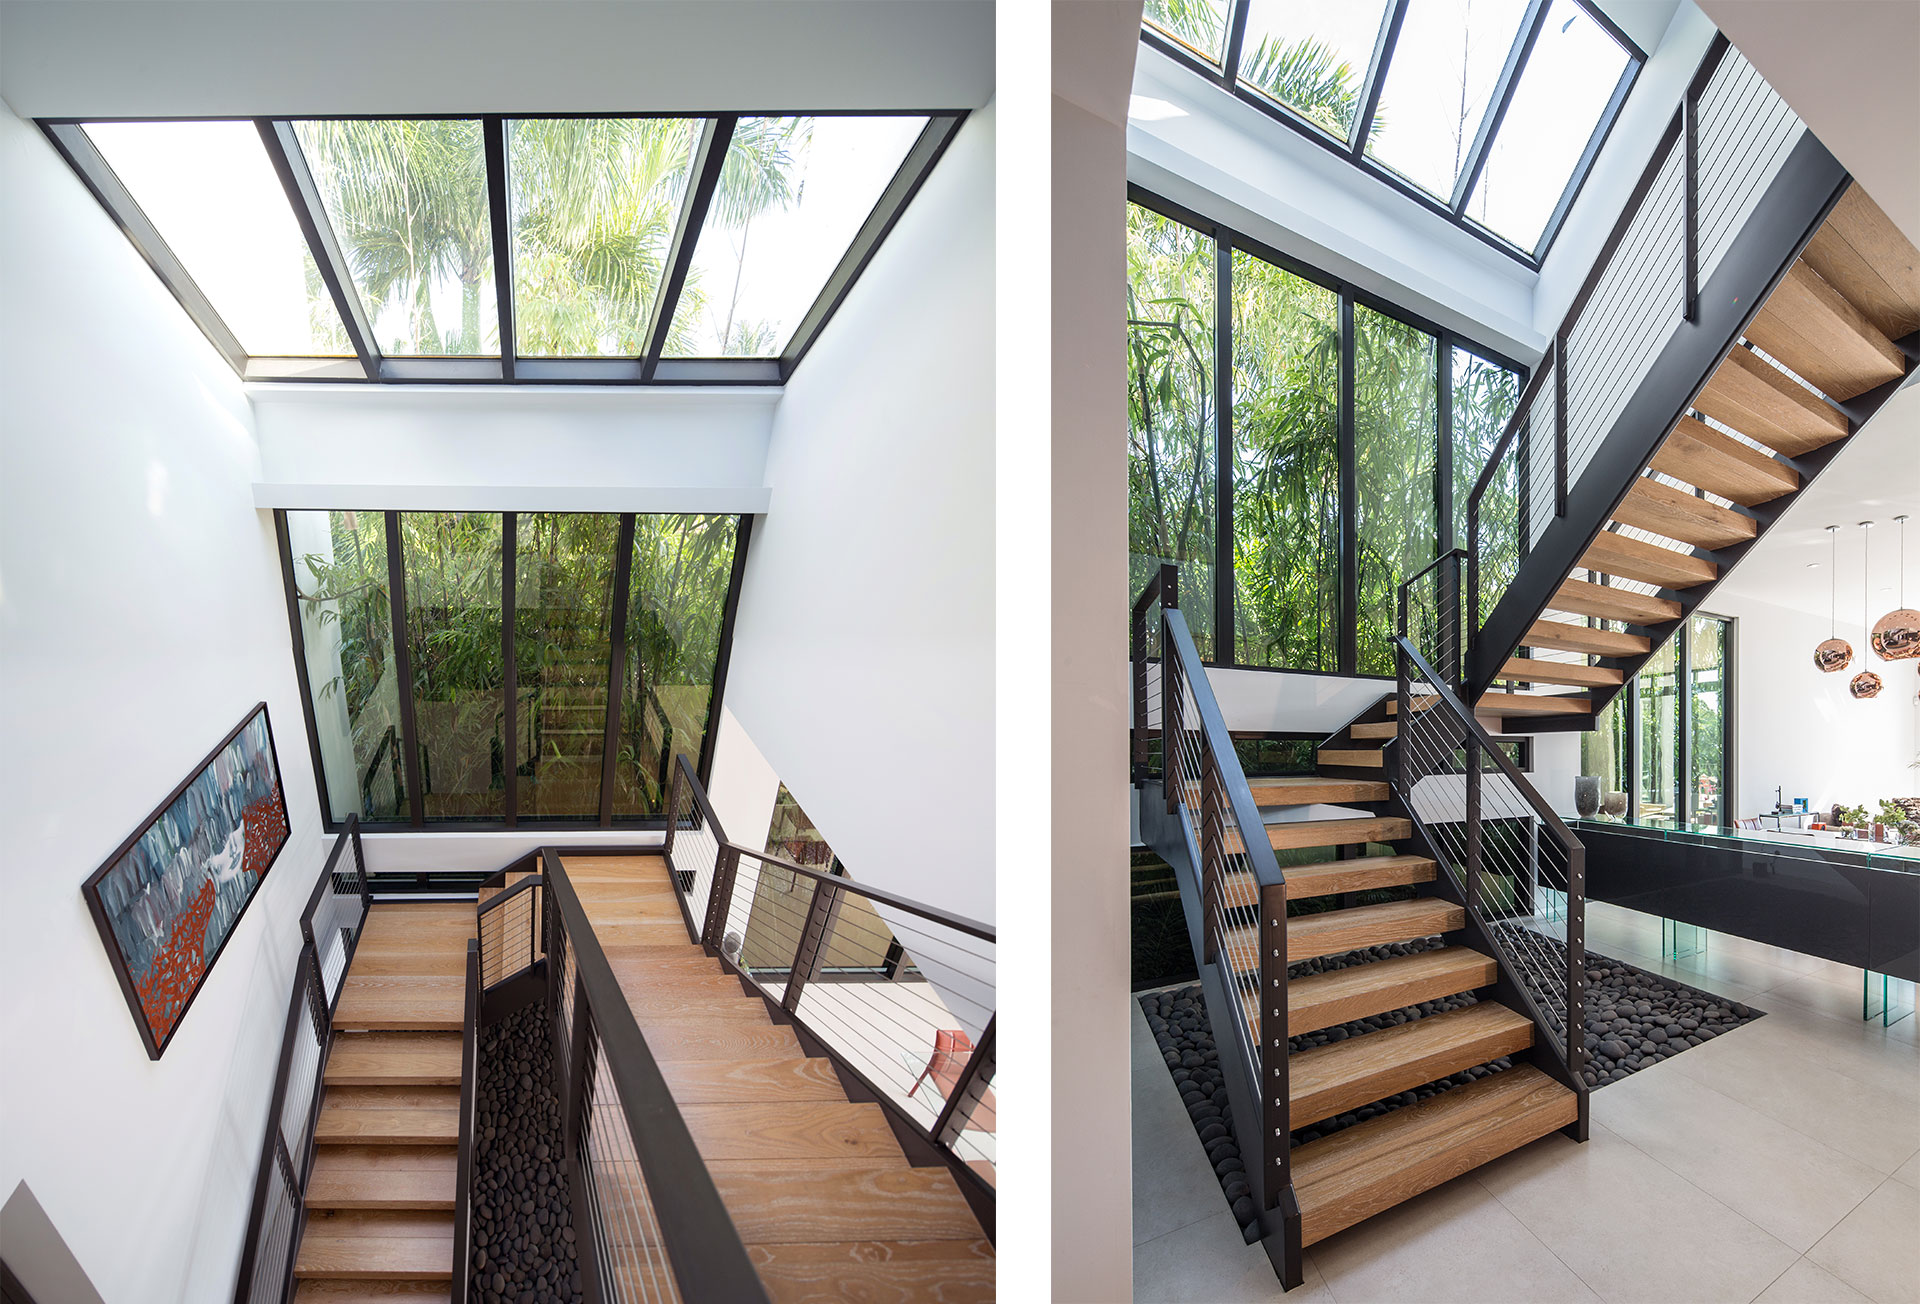 Interior Design hall view project in 475 Center Island Drive, Florida